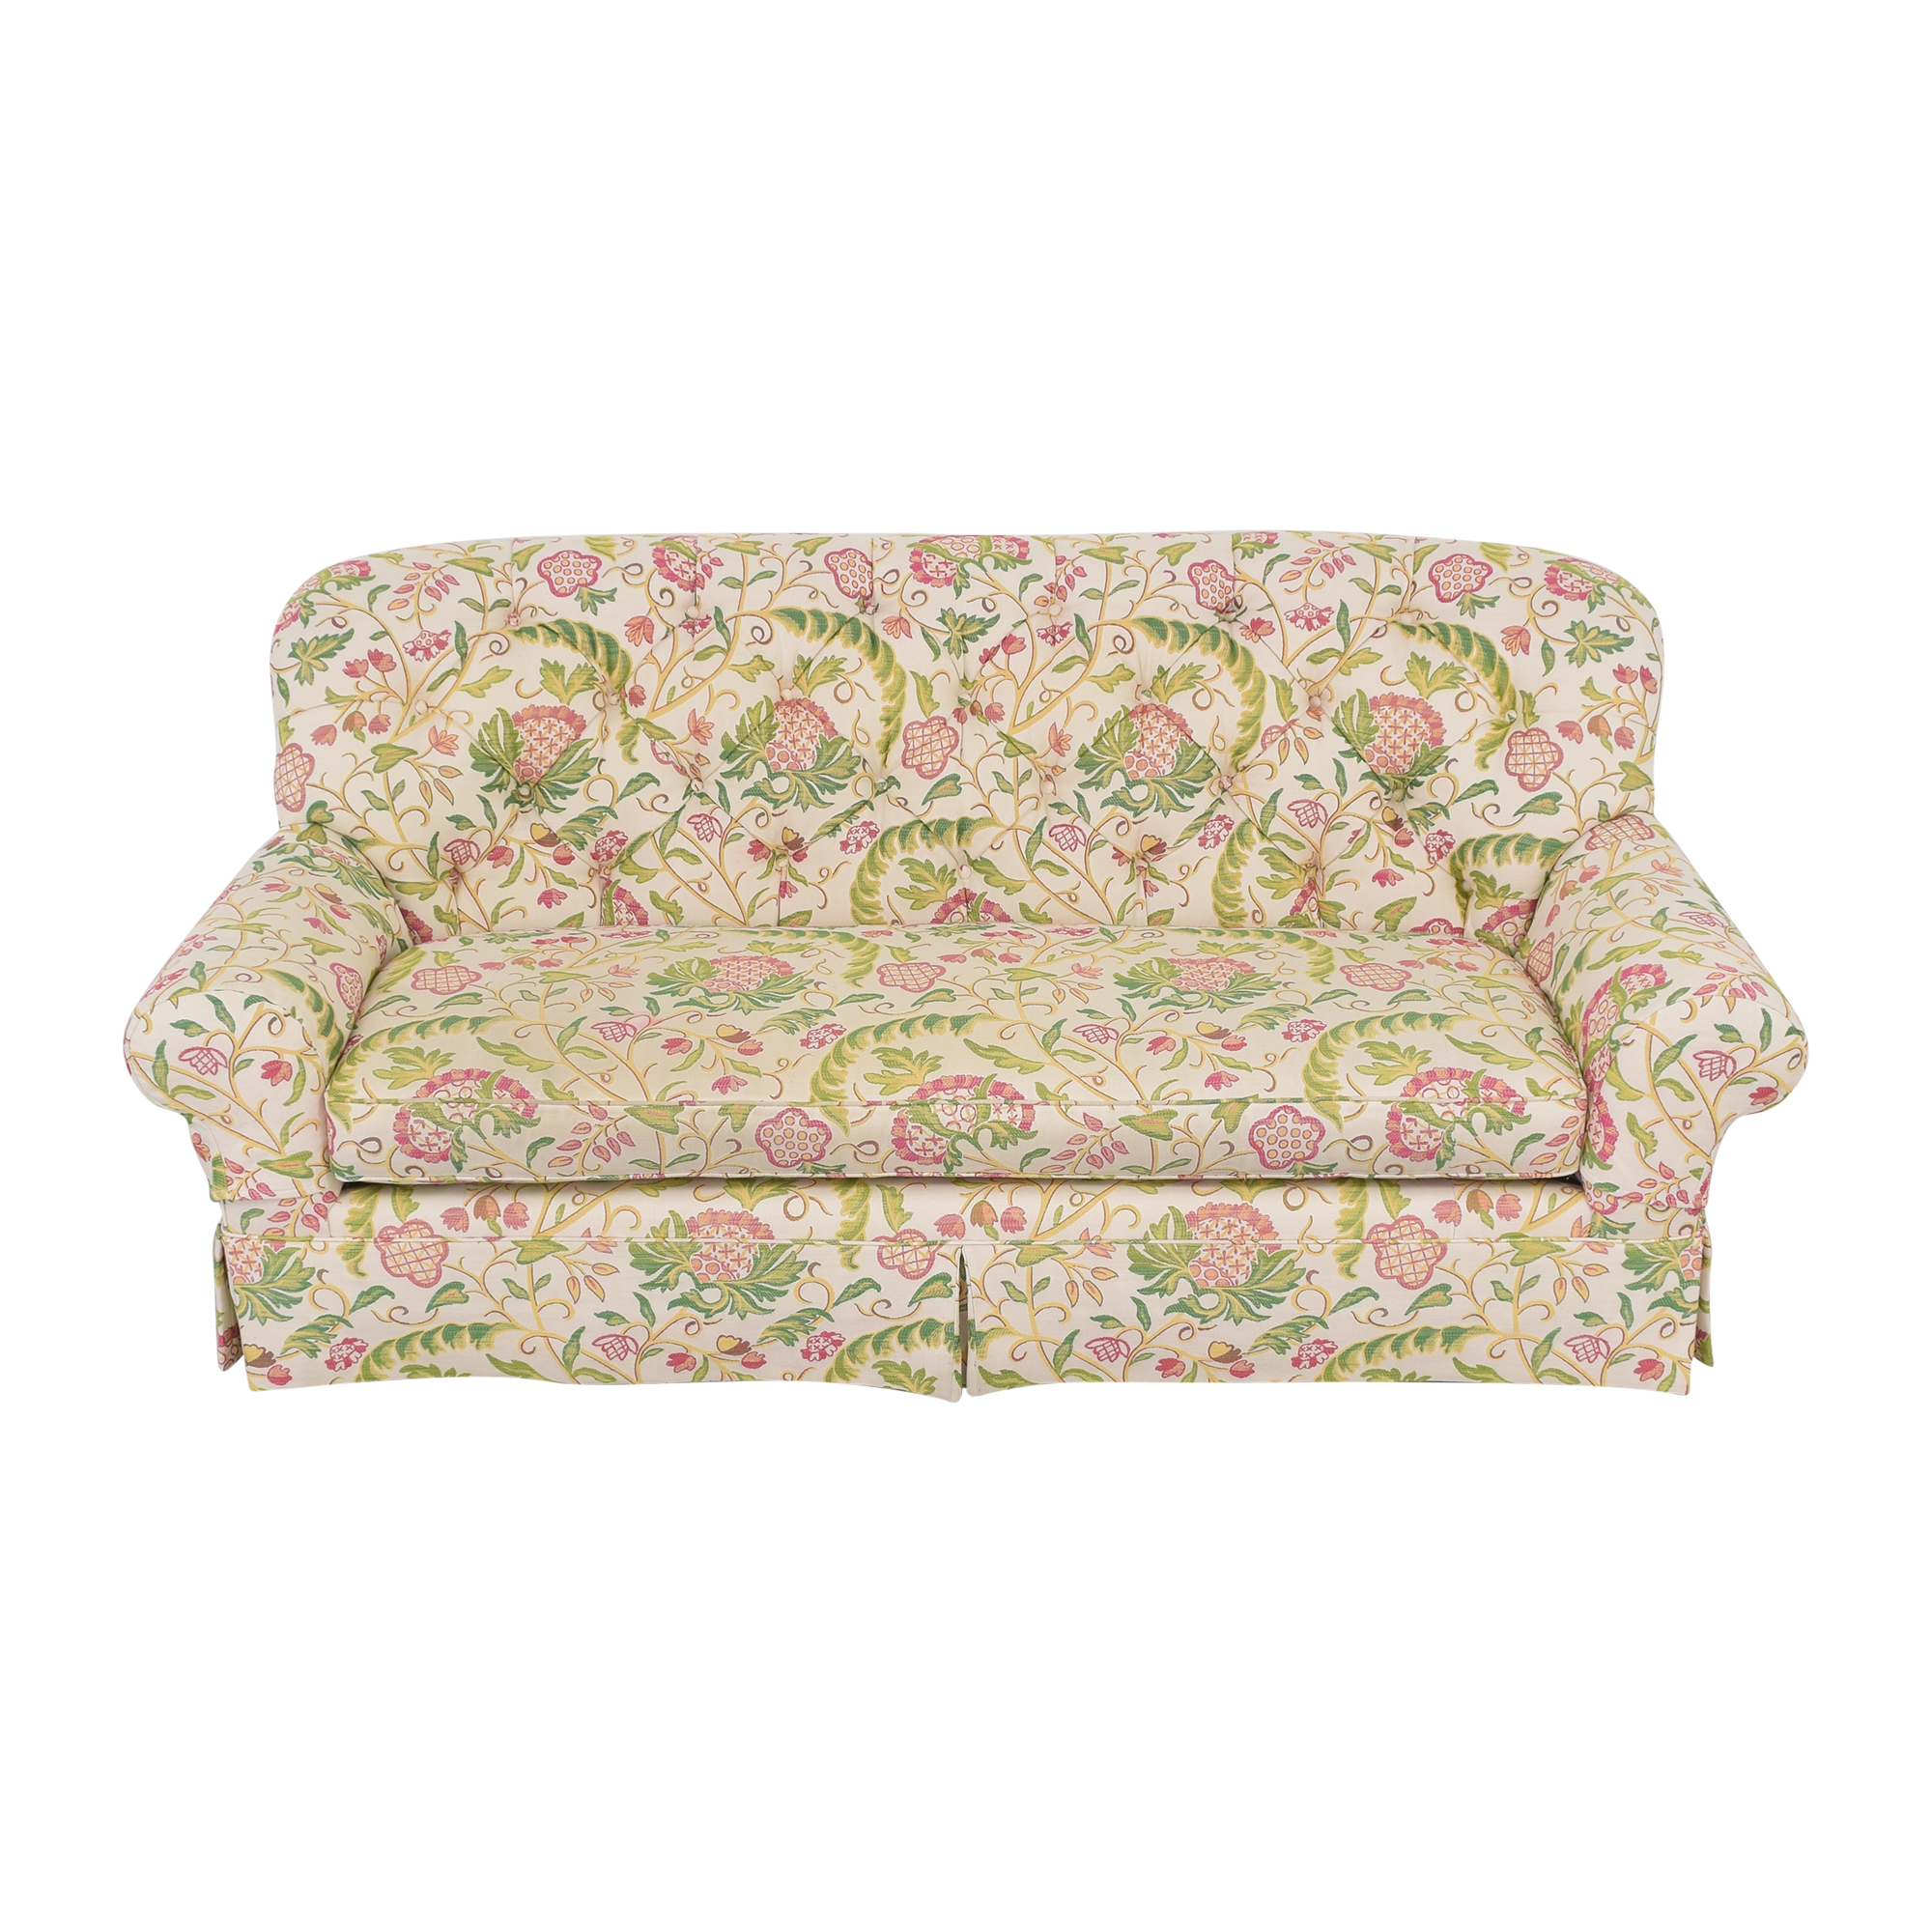 Stickley Furniture Stickley Furniture Custom Upholstered Sofa multi